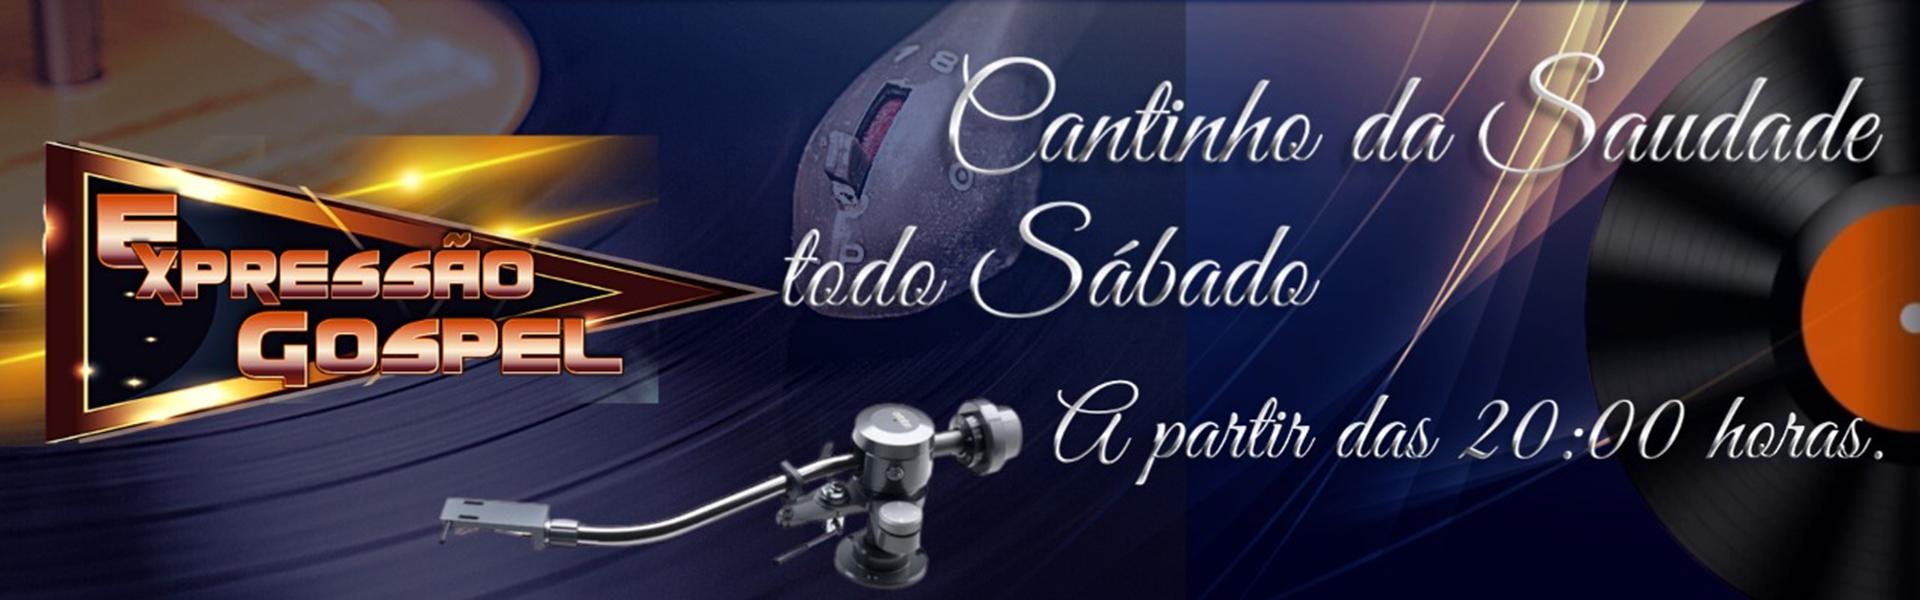 banner-cantinho